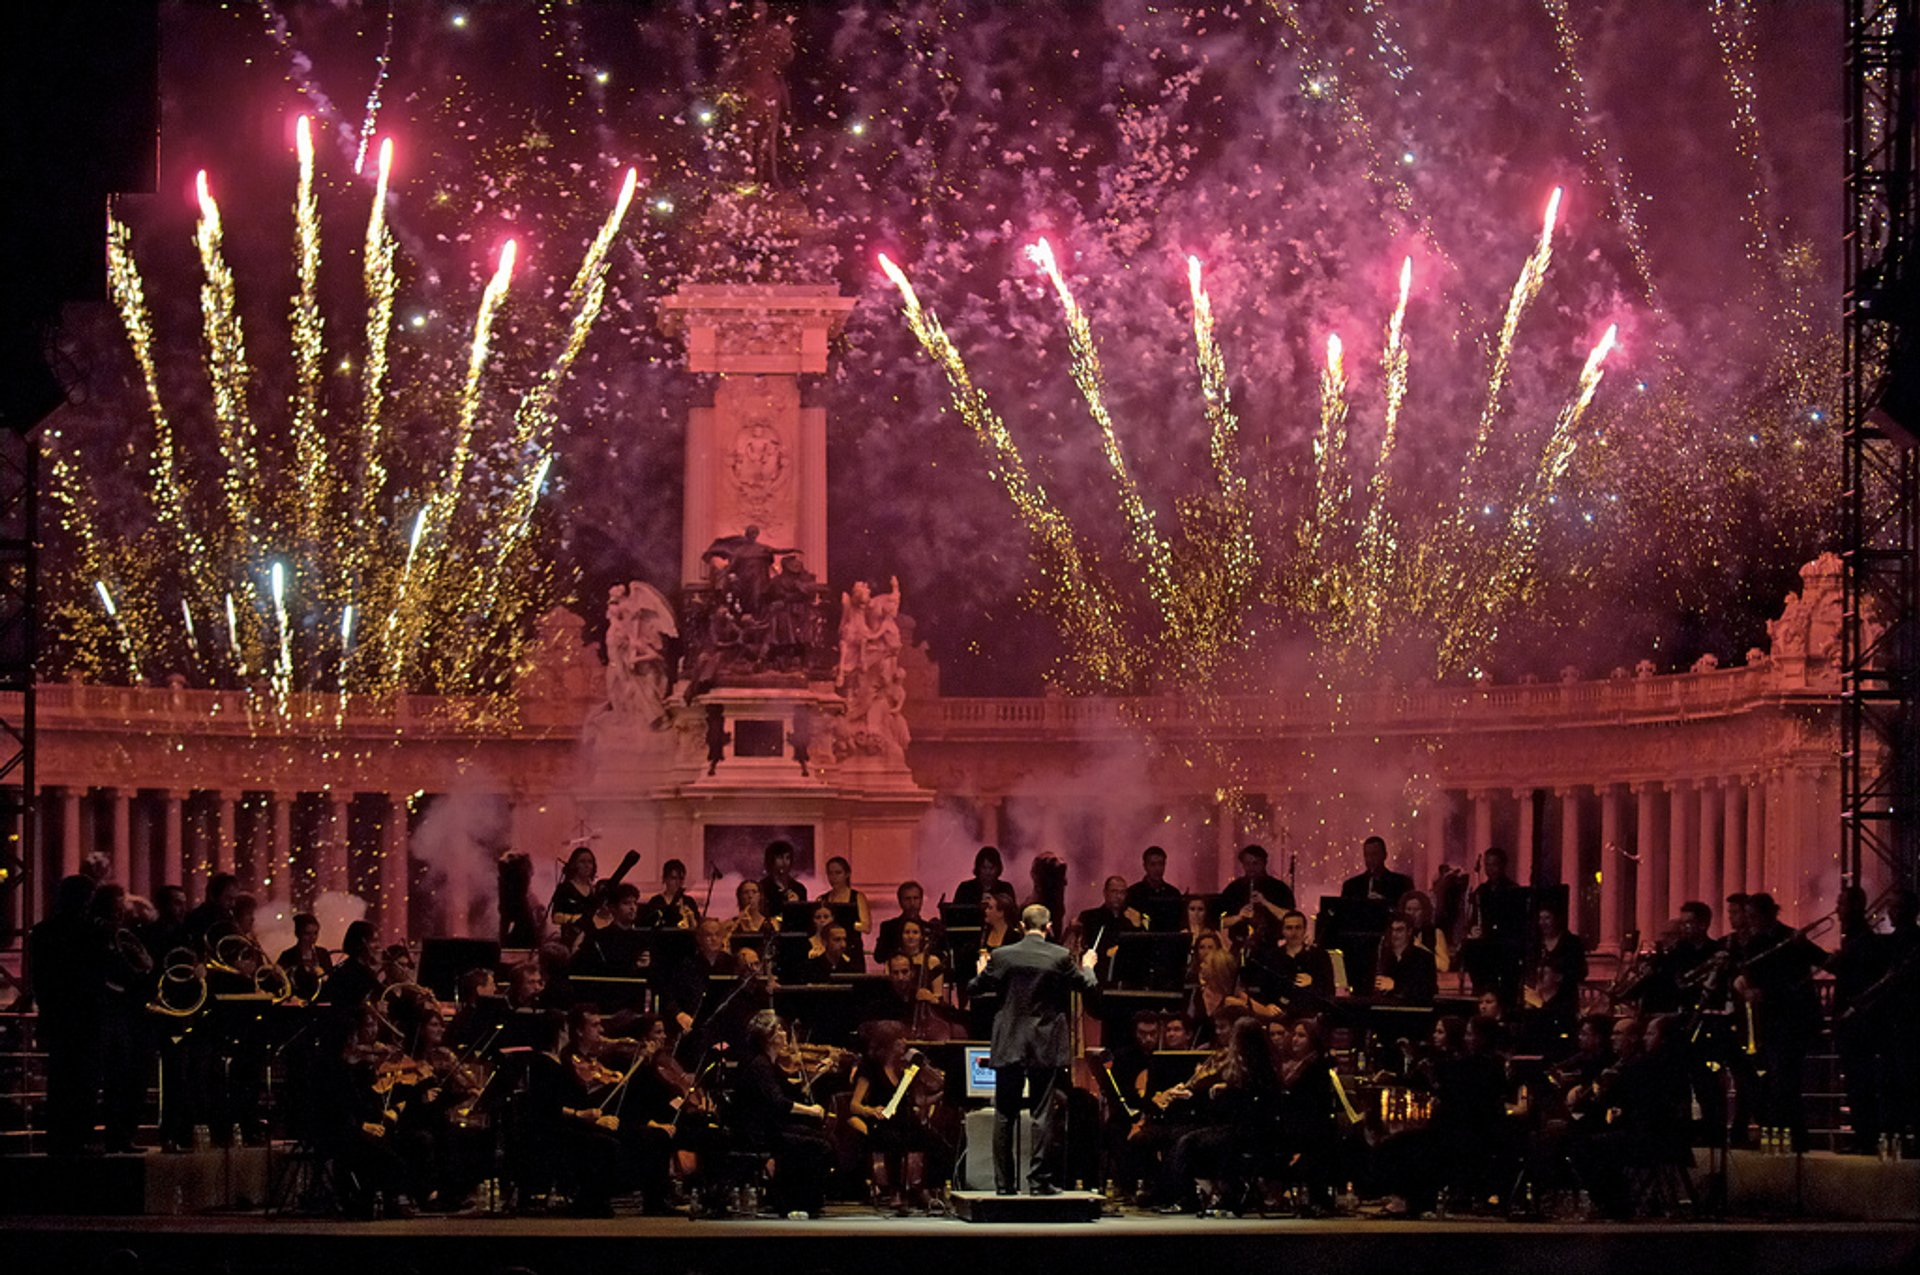 San Isidro Concert at Retiro Park 2020